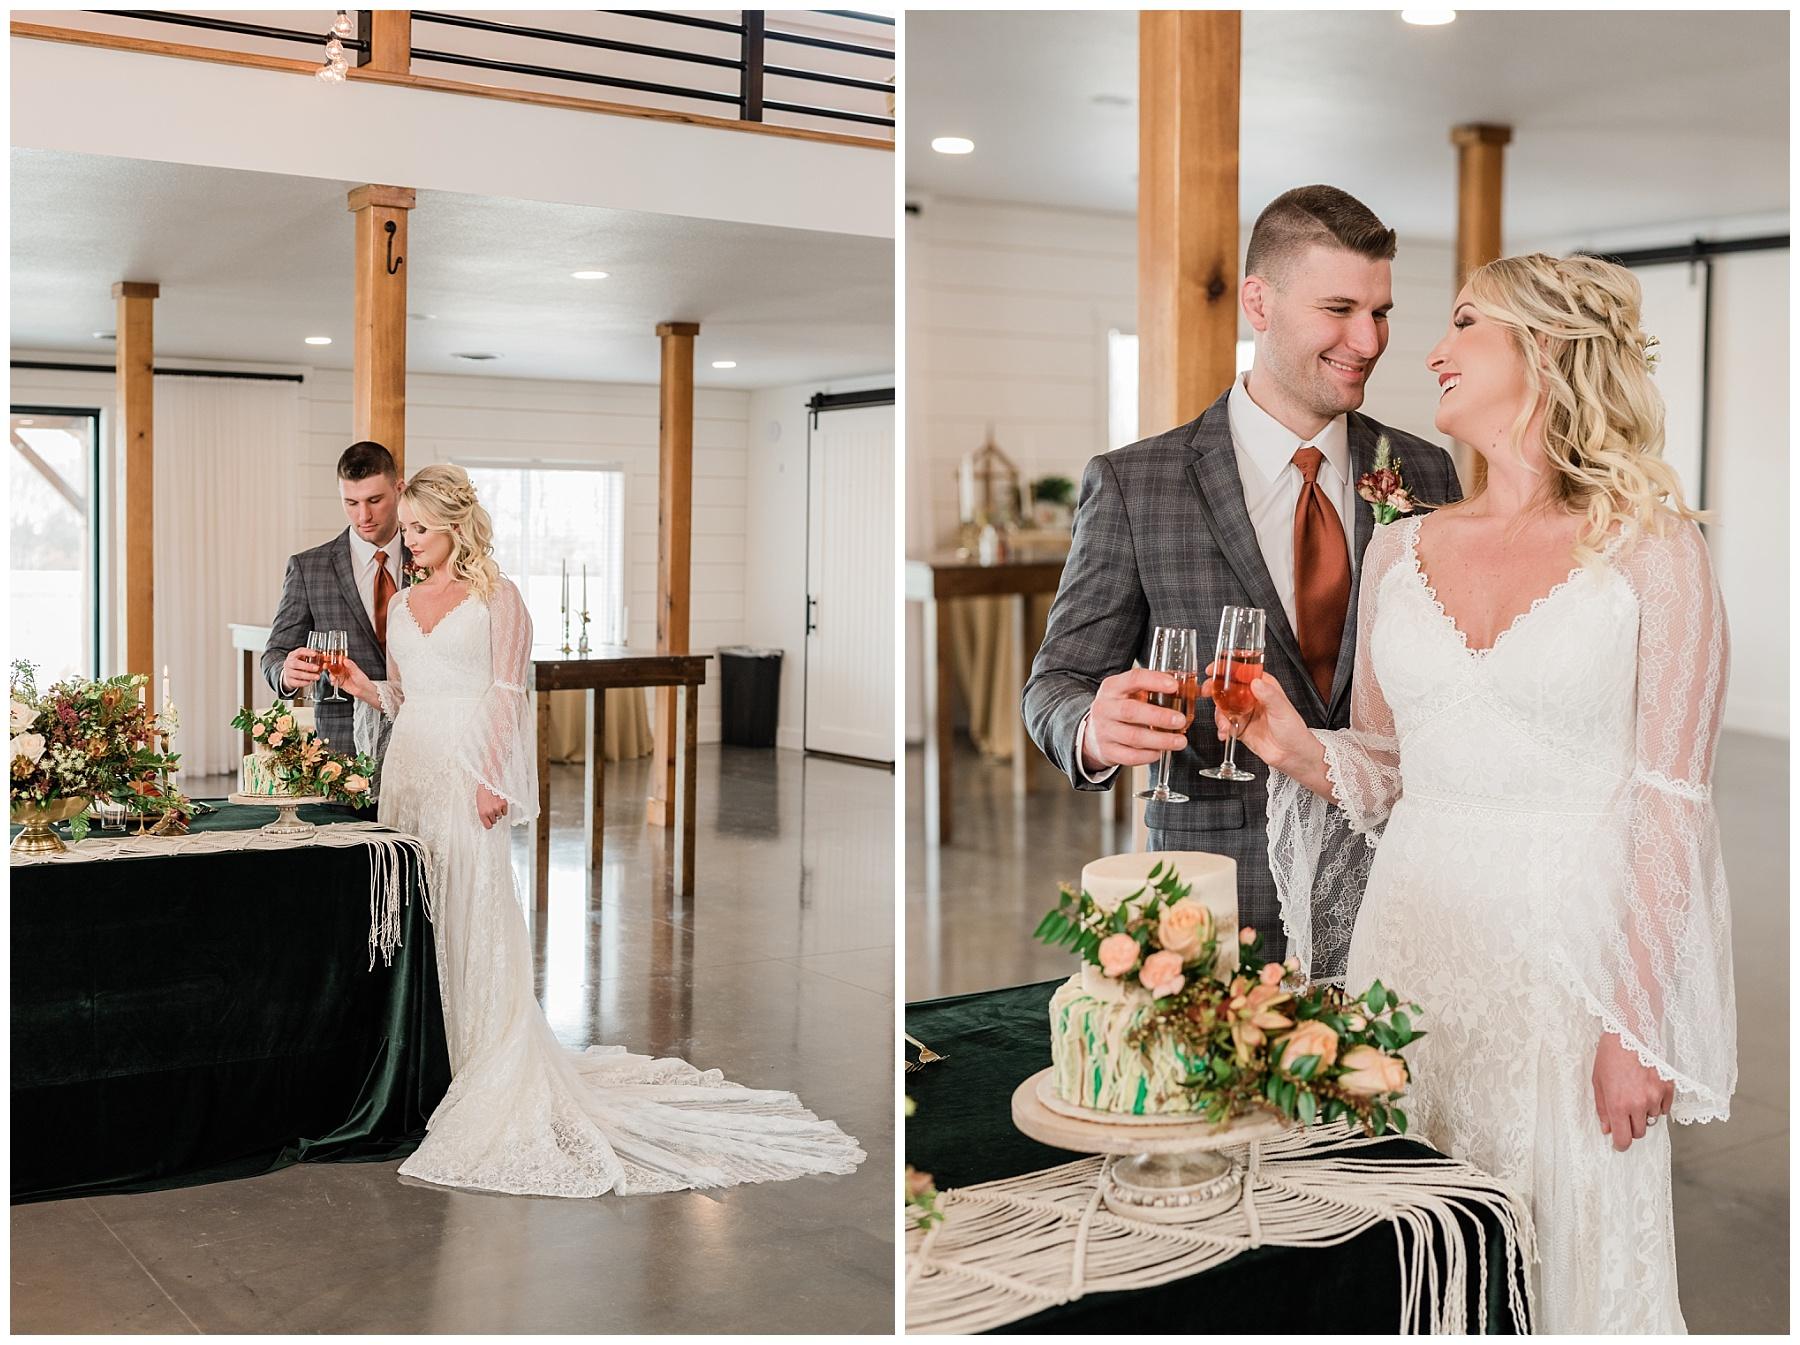 Eclectic Scandinavian Winter Wedding in All White Venue Emerson Fields by Kelsi Kliethermes Photography Best Missouri and Maui Wedding Photographer_0057.jpg